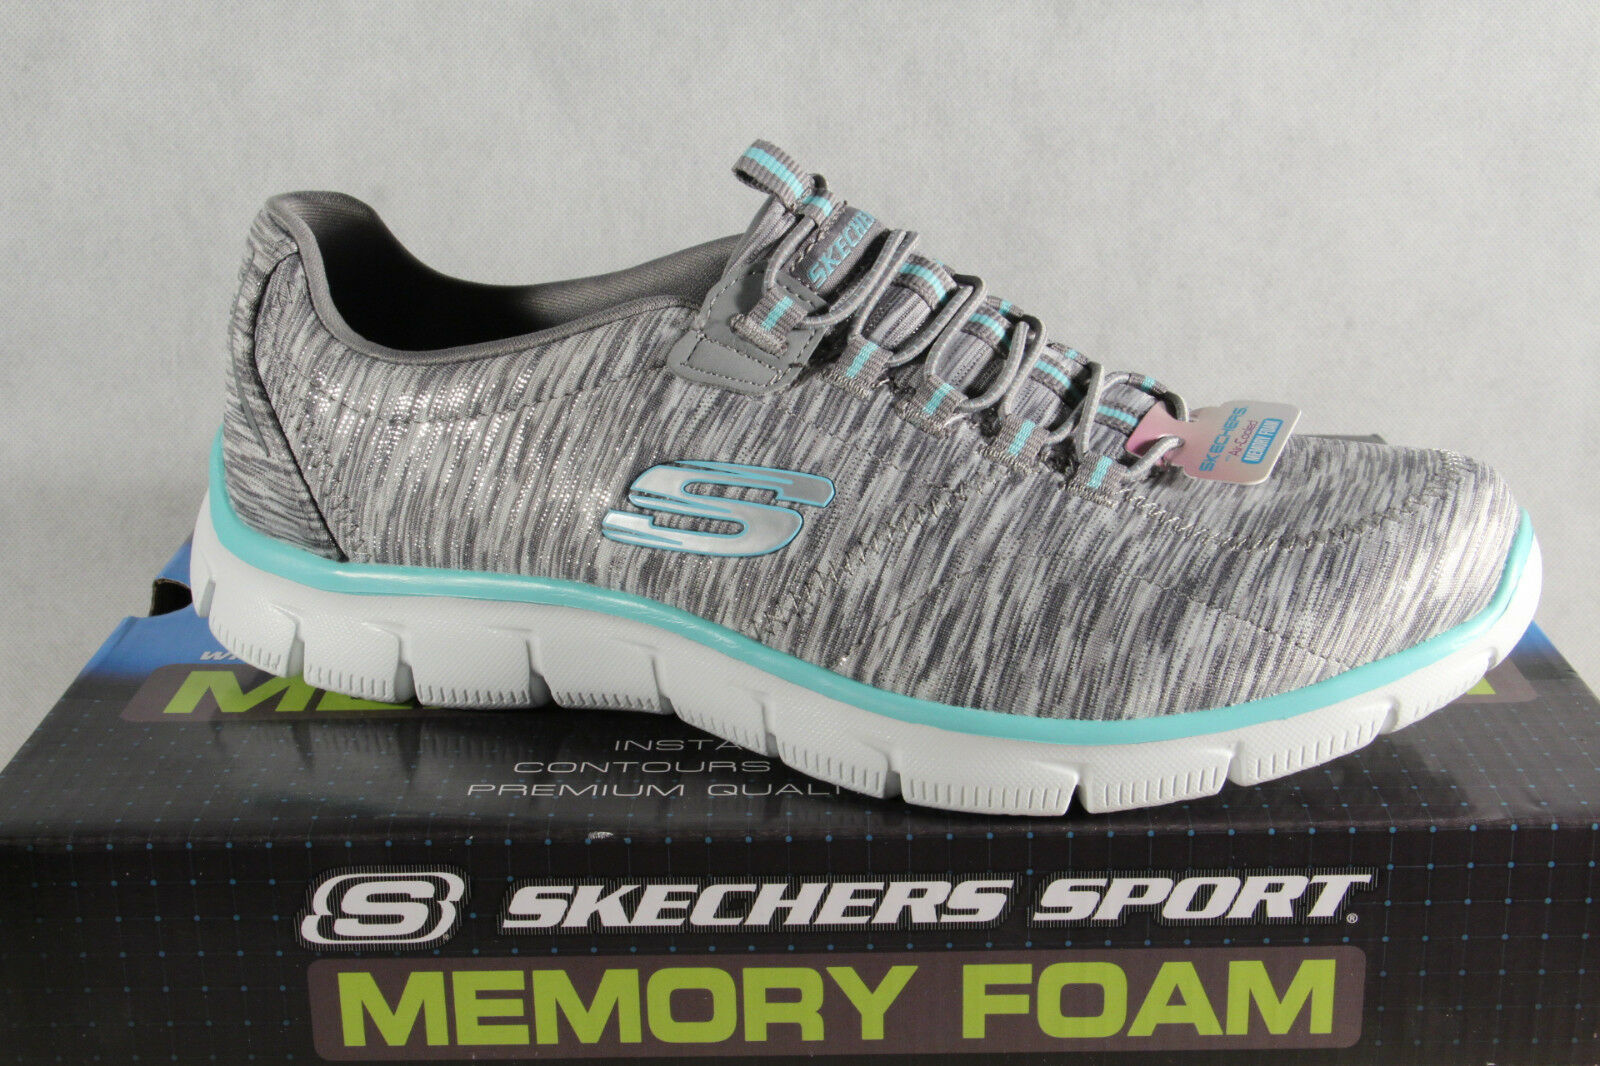 Skechers Slipper Sneakers Sportschuhe Air Cooled Memory Foam grau NEU!